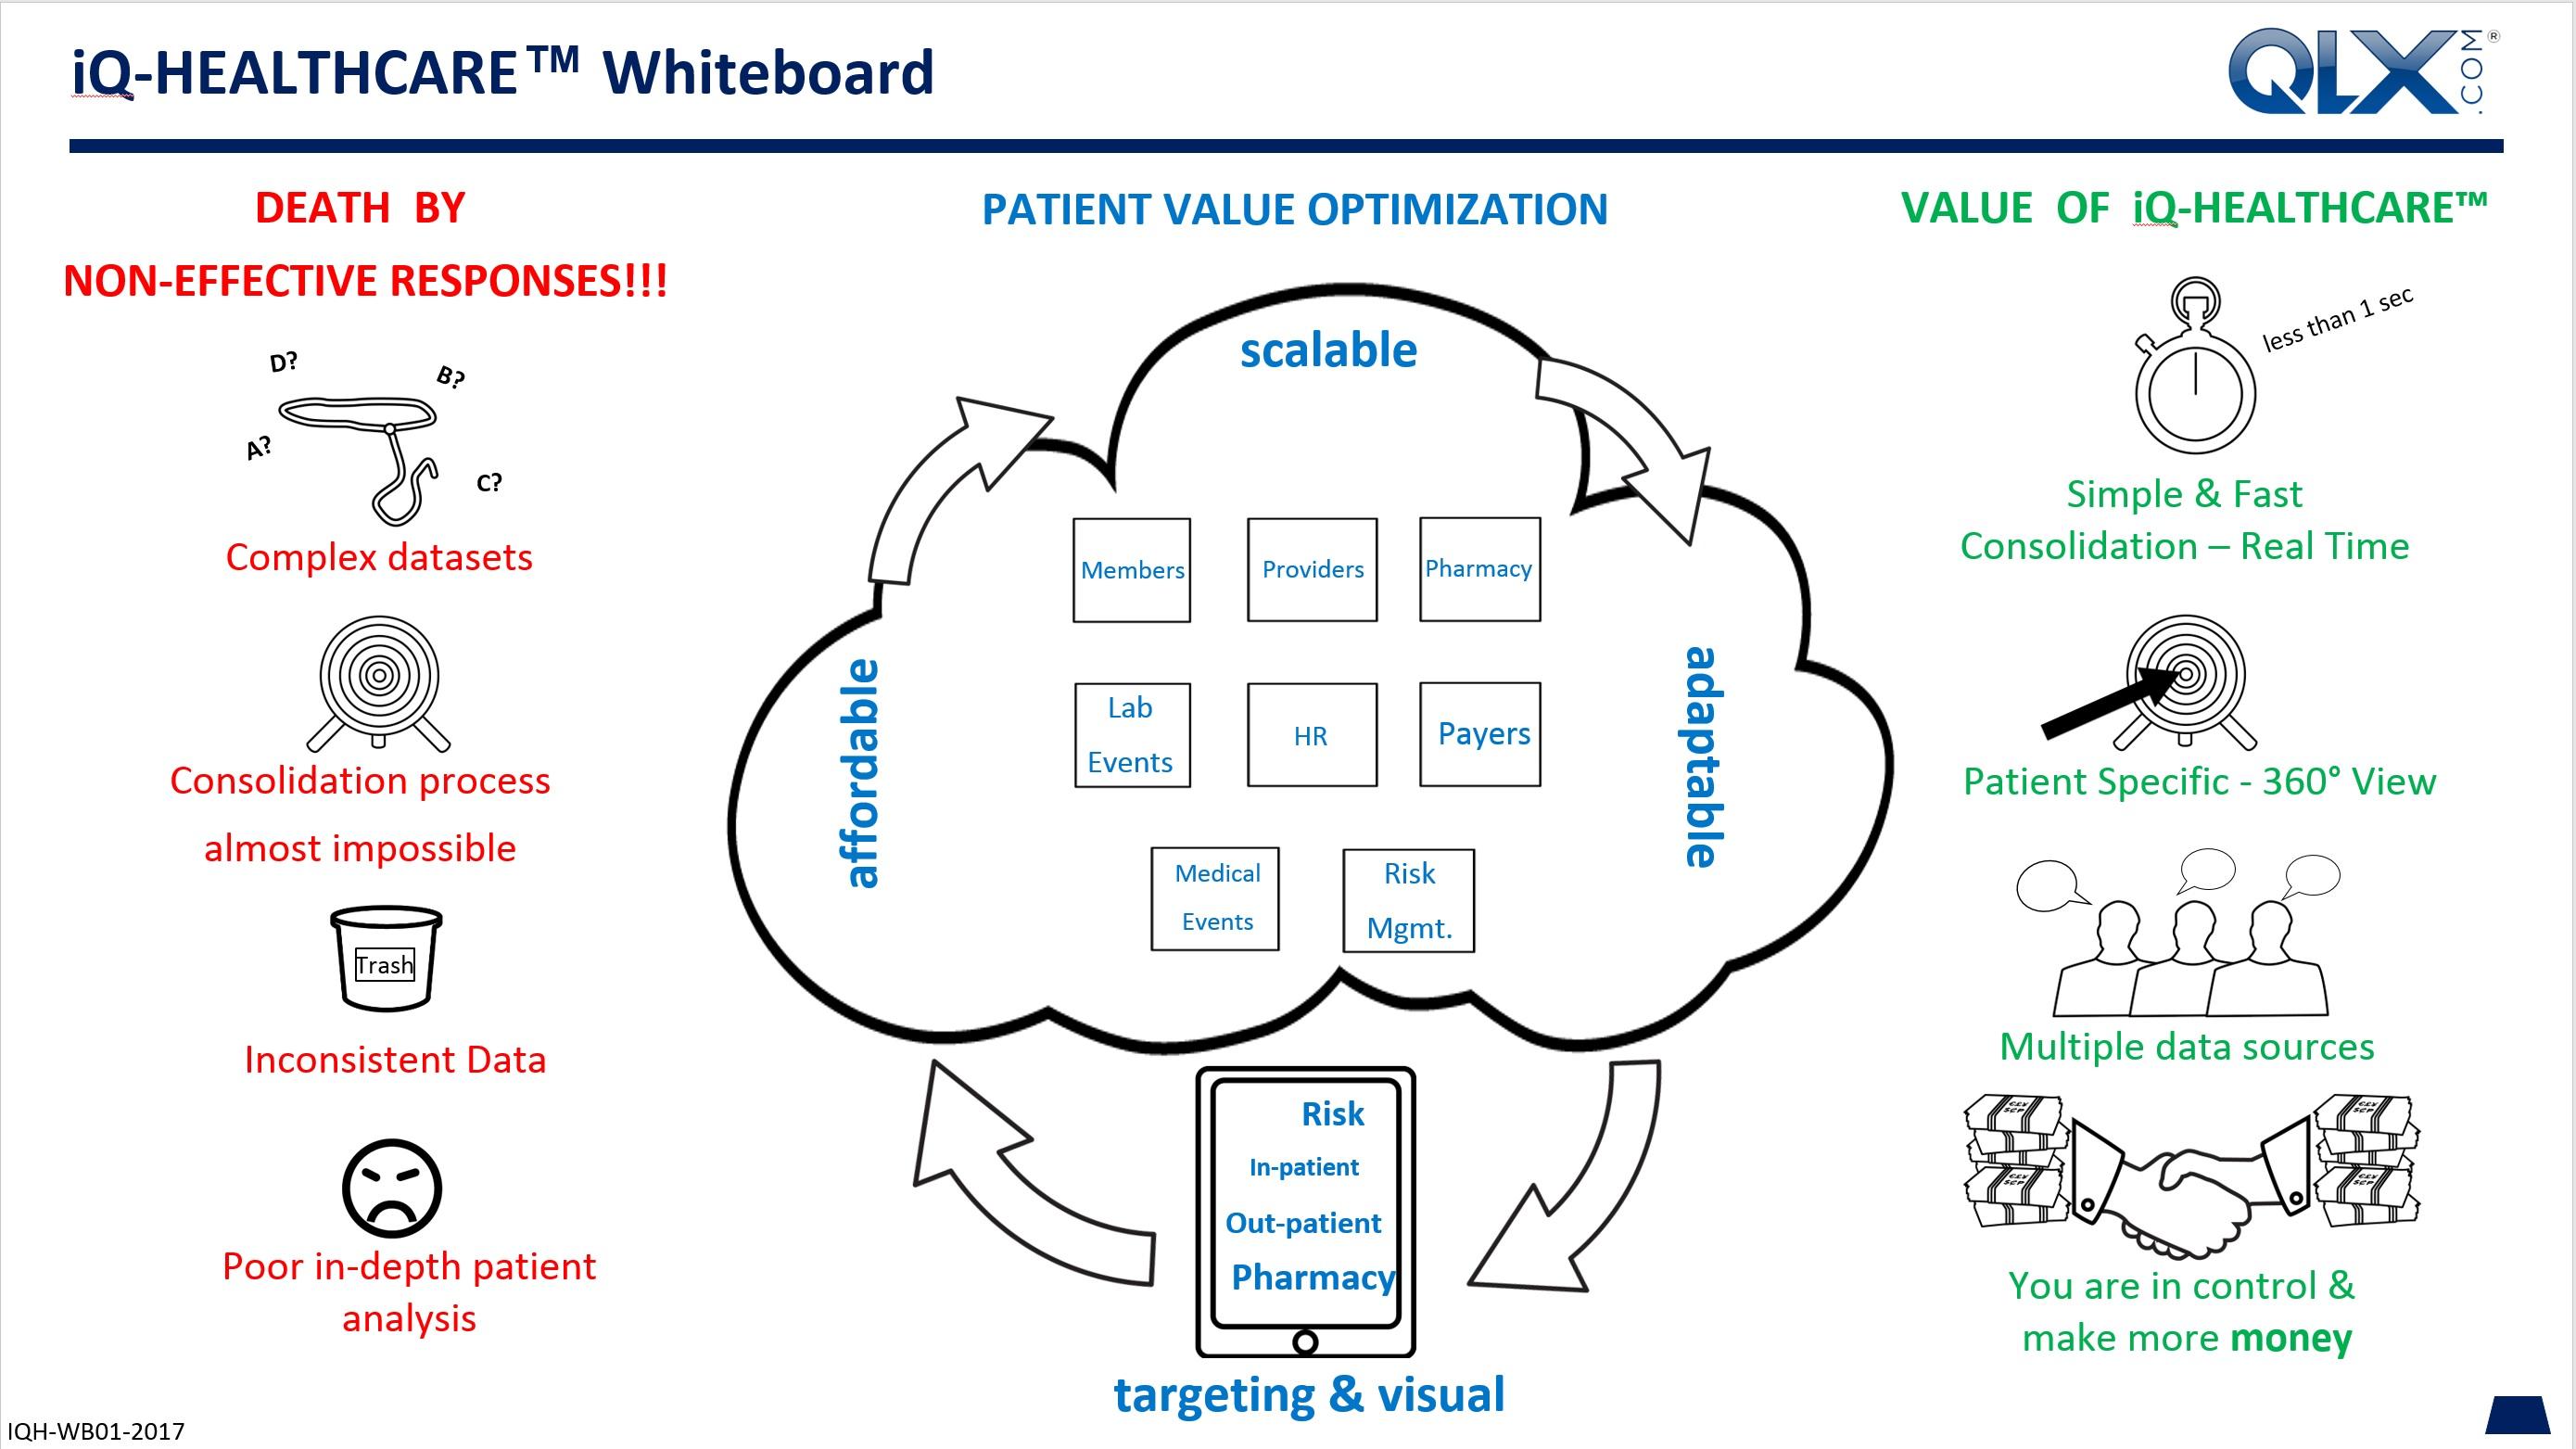 QLX Whiteboard iQ-Healthcare